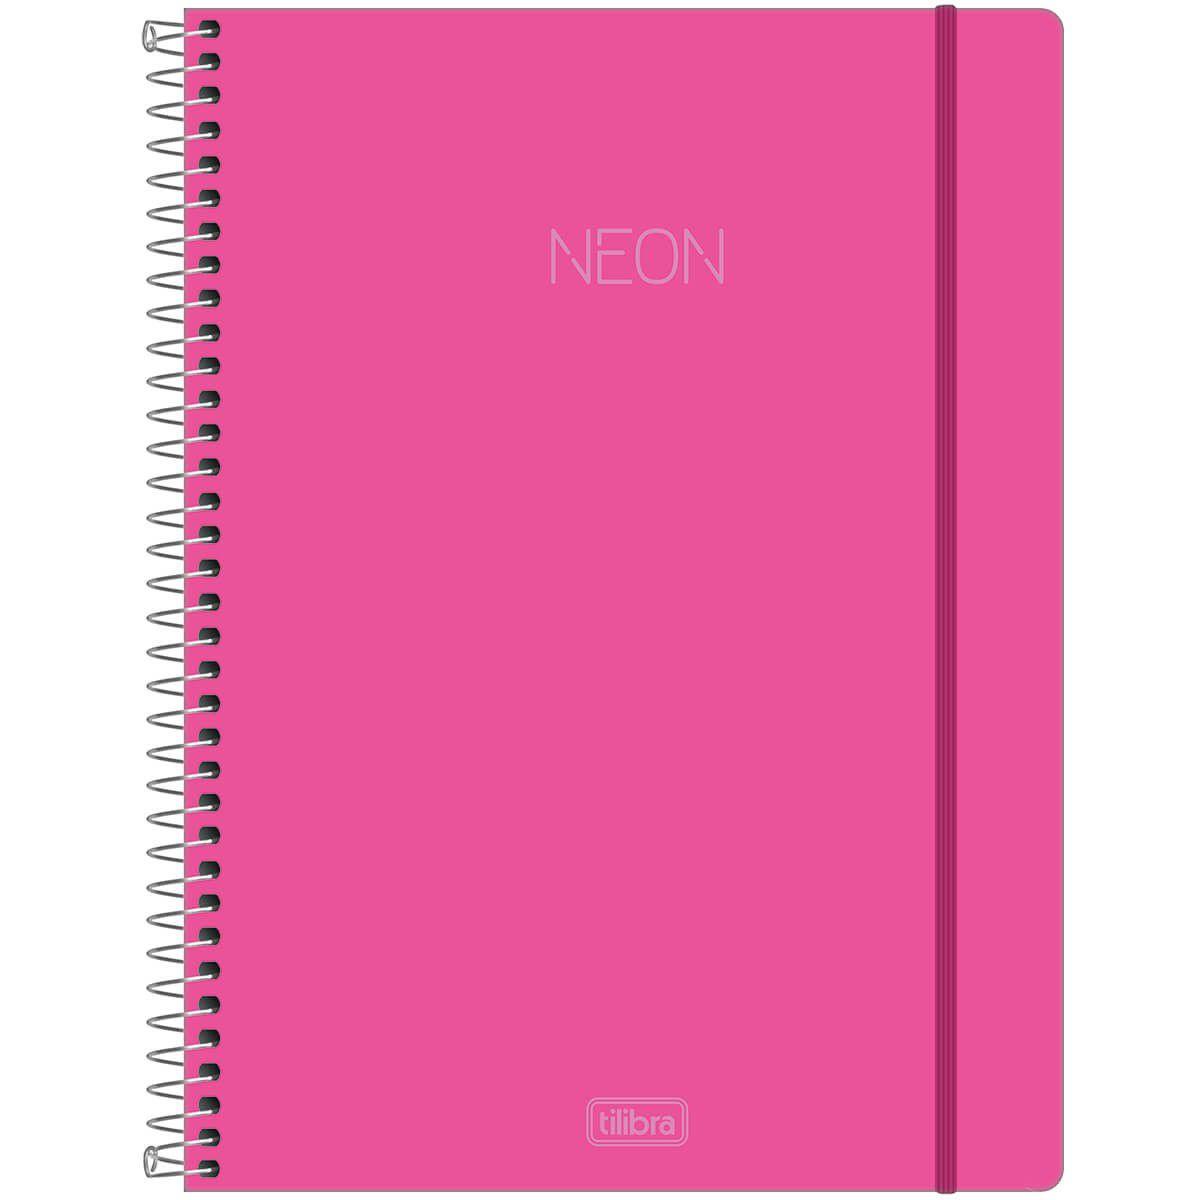 Caderno Tilibra Capa Dura Capa Plastica Universitário Neon Rosa 1M 80 Fls 302473 27815